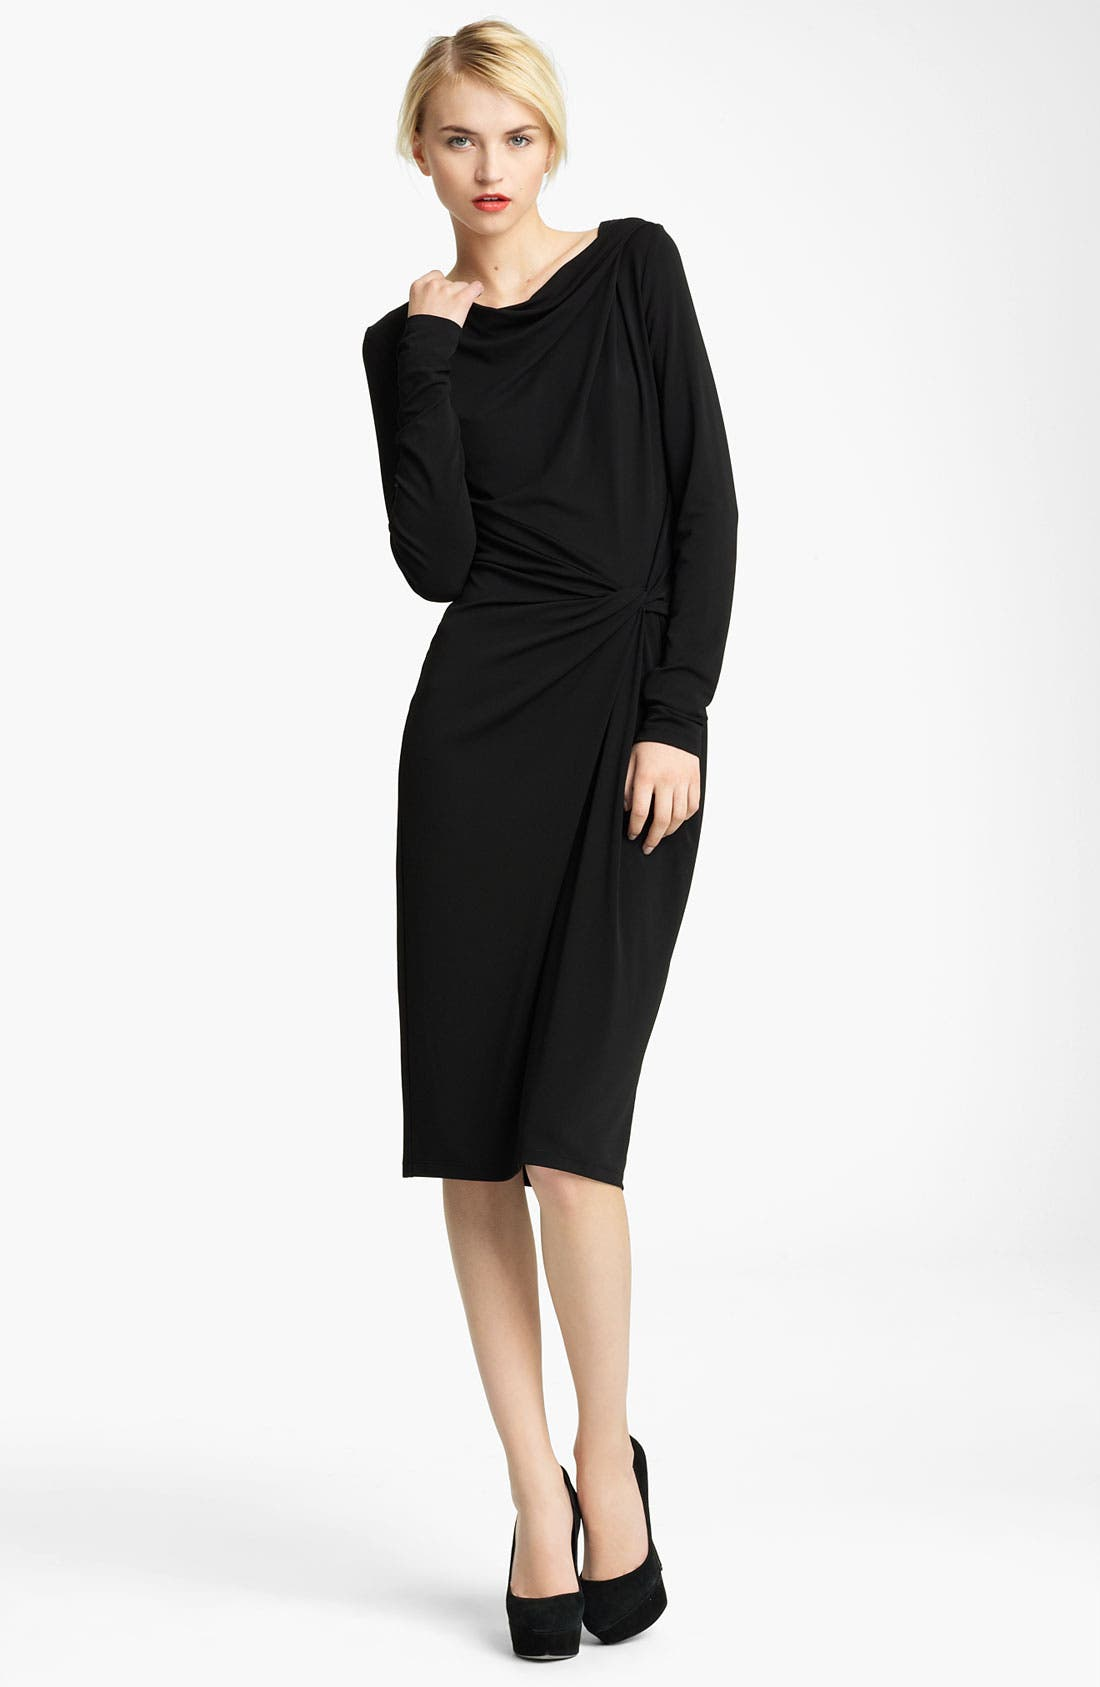 Alternate Image 1 Selected - Michael Kors Asymmetrical Twist Jersey Dress